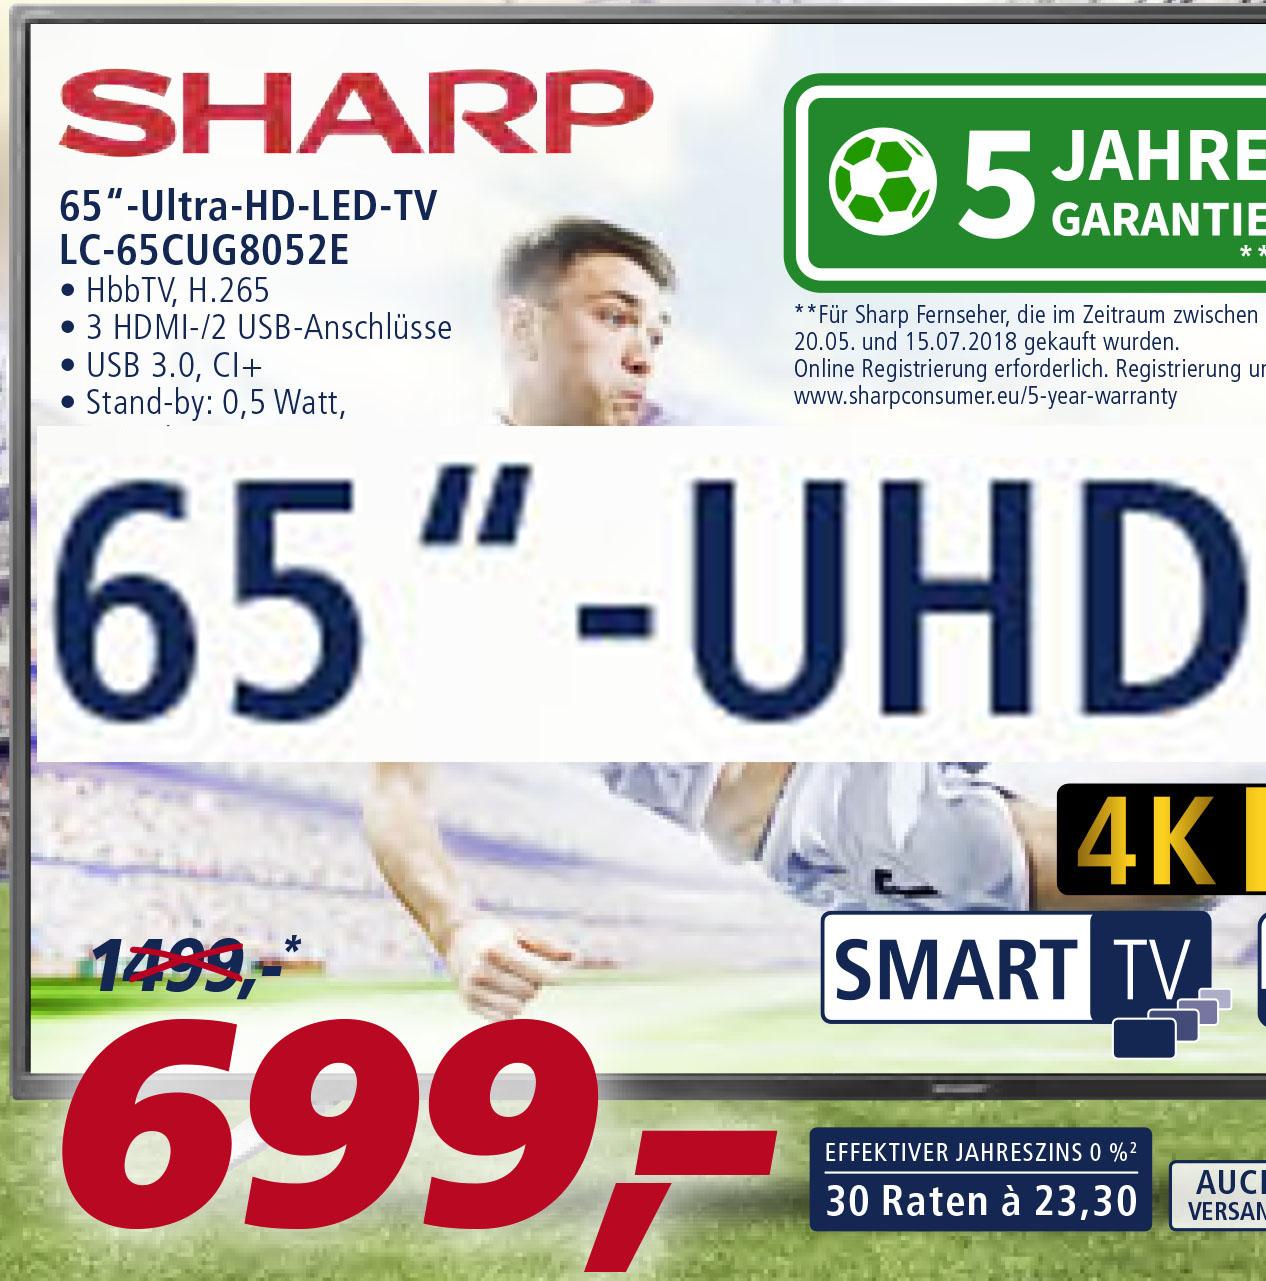 Sharp UHD TV LC-65CU8052E, 65 Zoll, Triple Tuner, SmartTV für 699€ [Real]